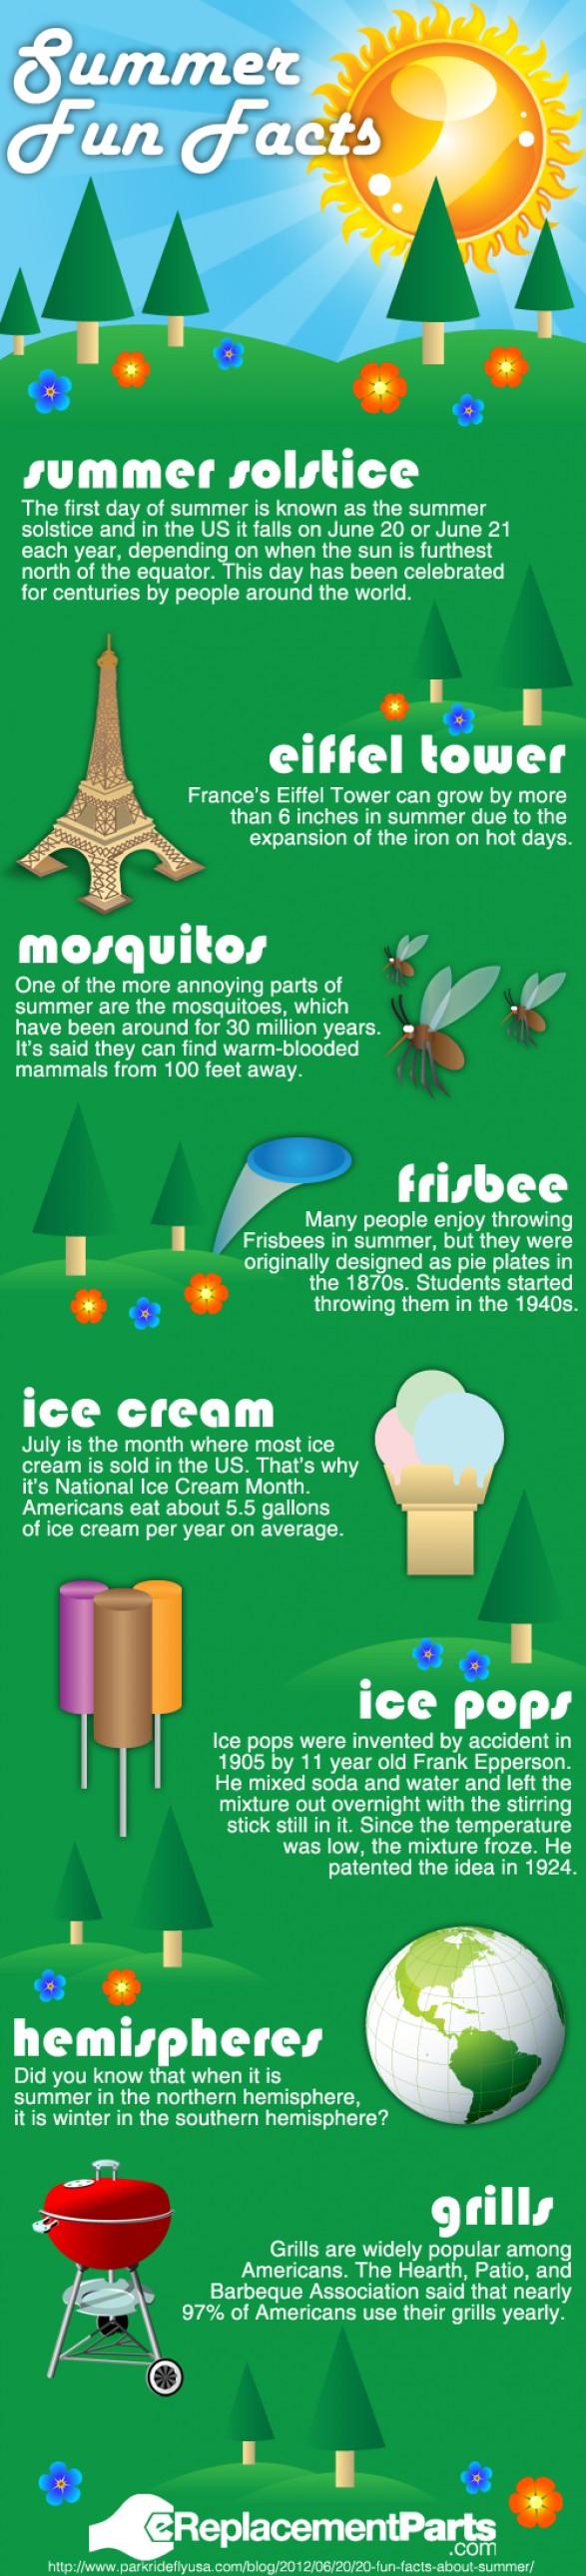 Summer Fun Facts